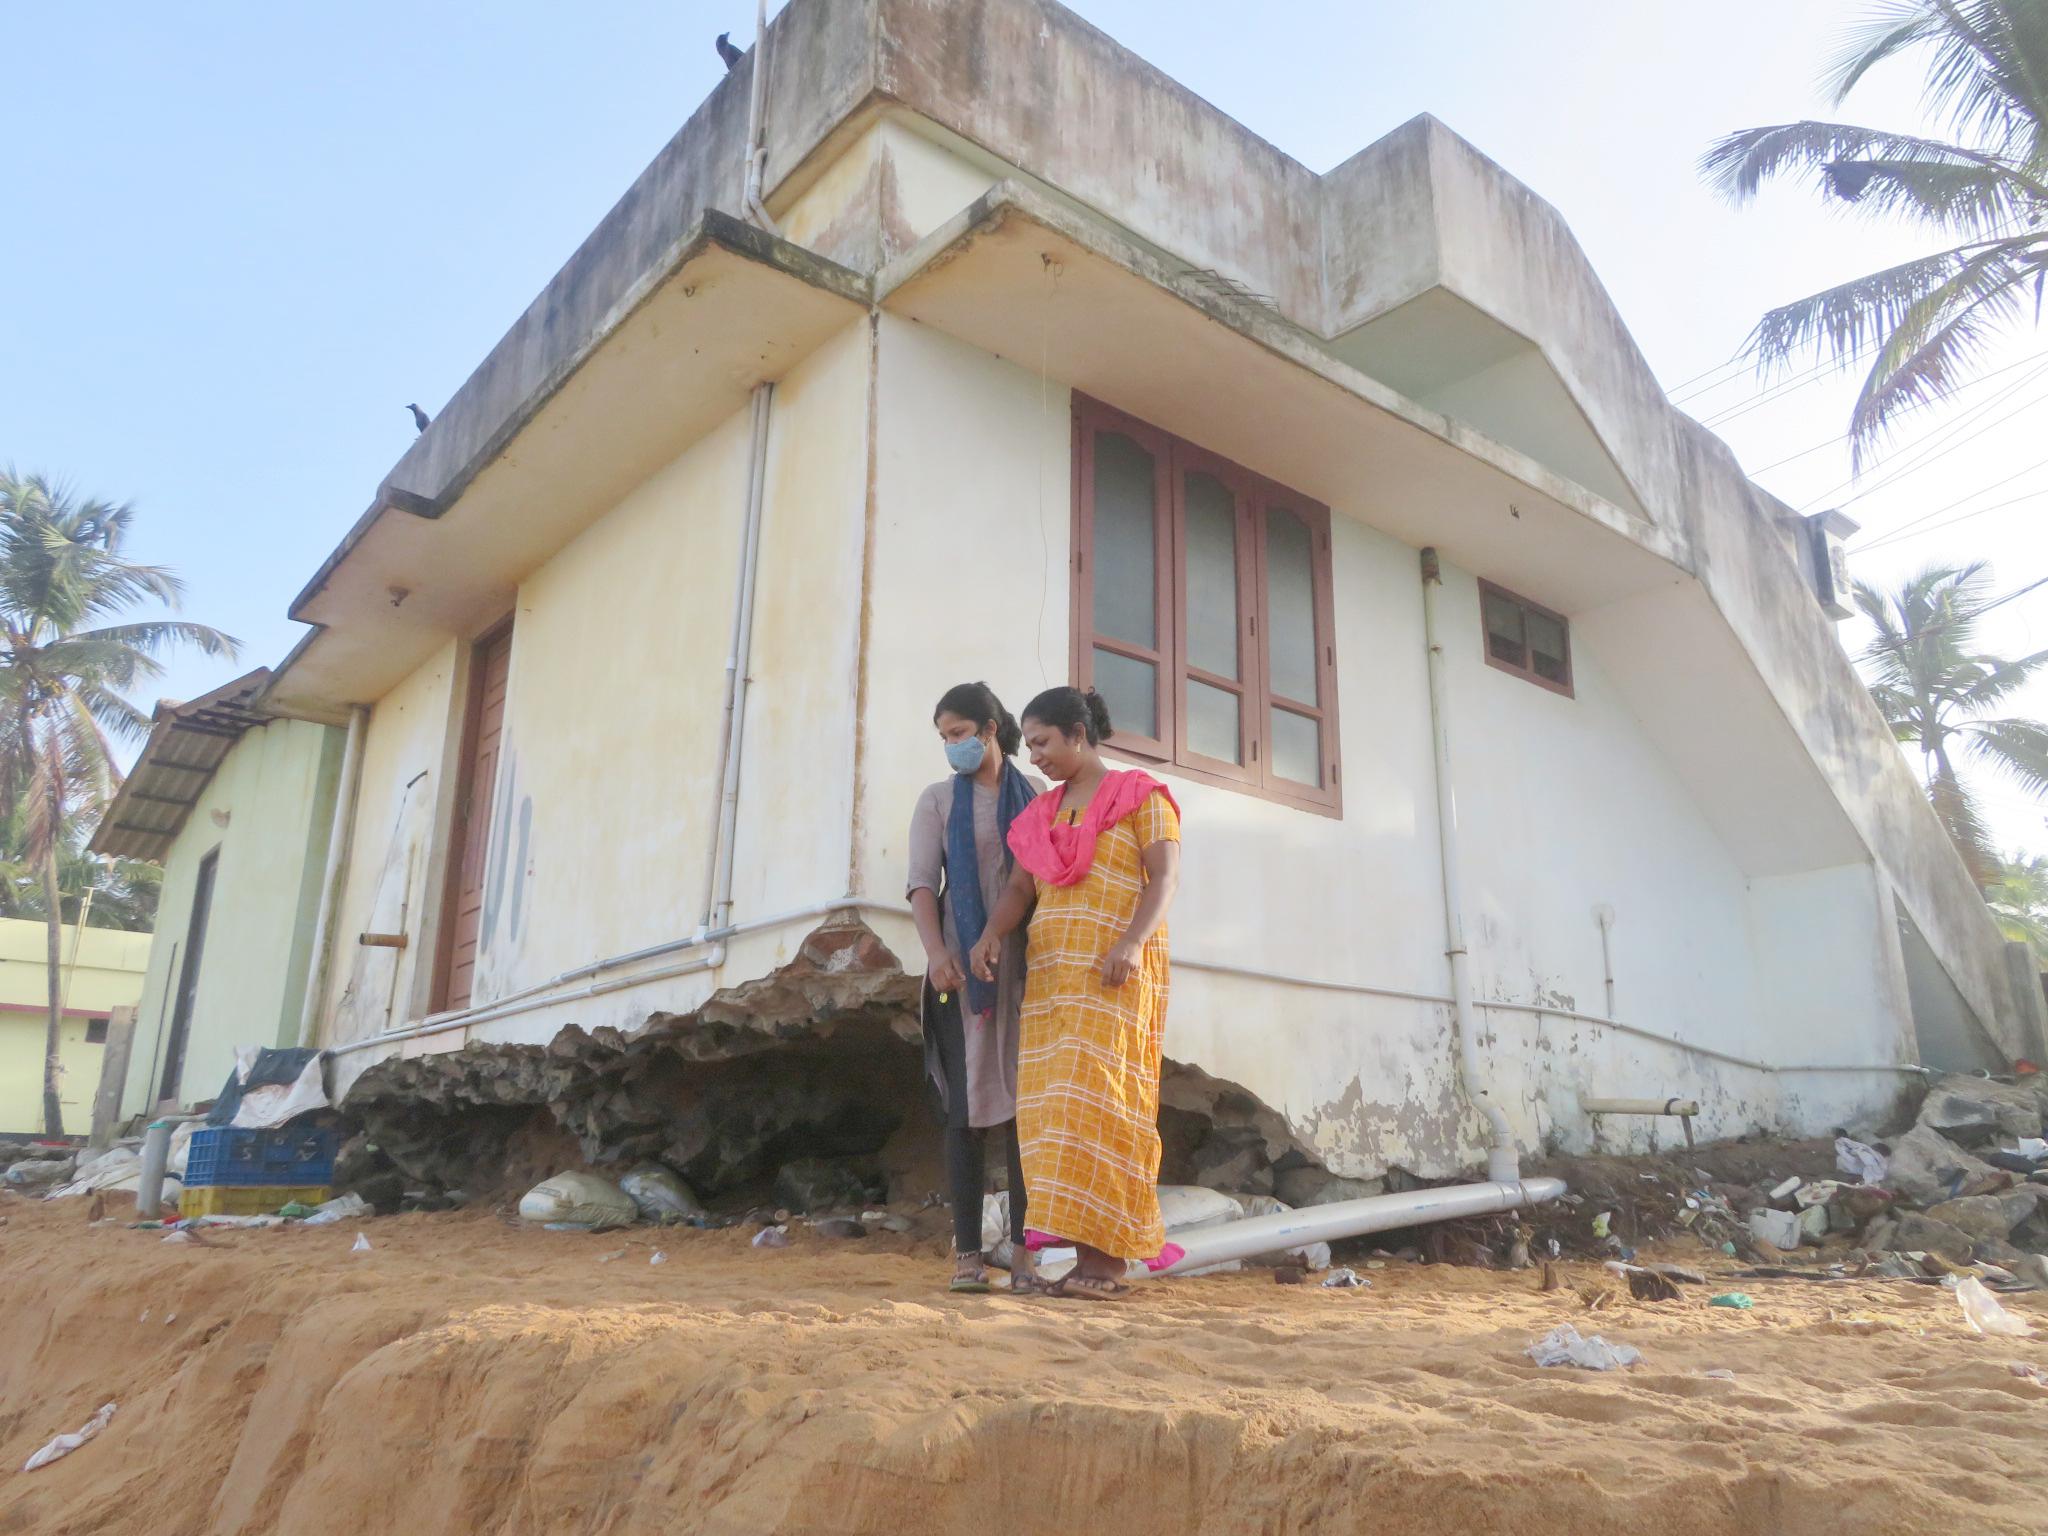 The family home of Preetha Jerald, on the brink of destruction due to coastal erosion blamed on Adani's Vizhinjam port redevelopment